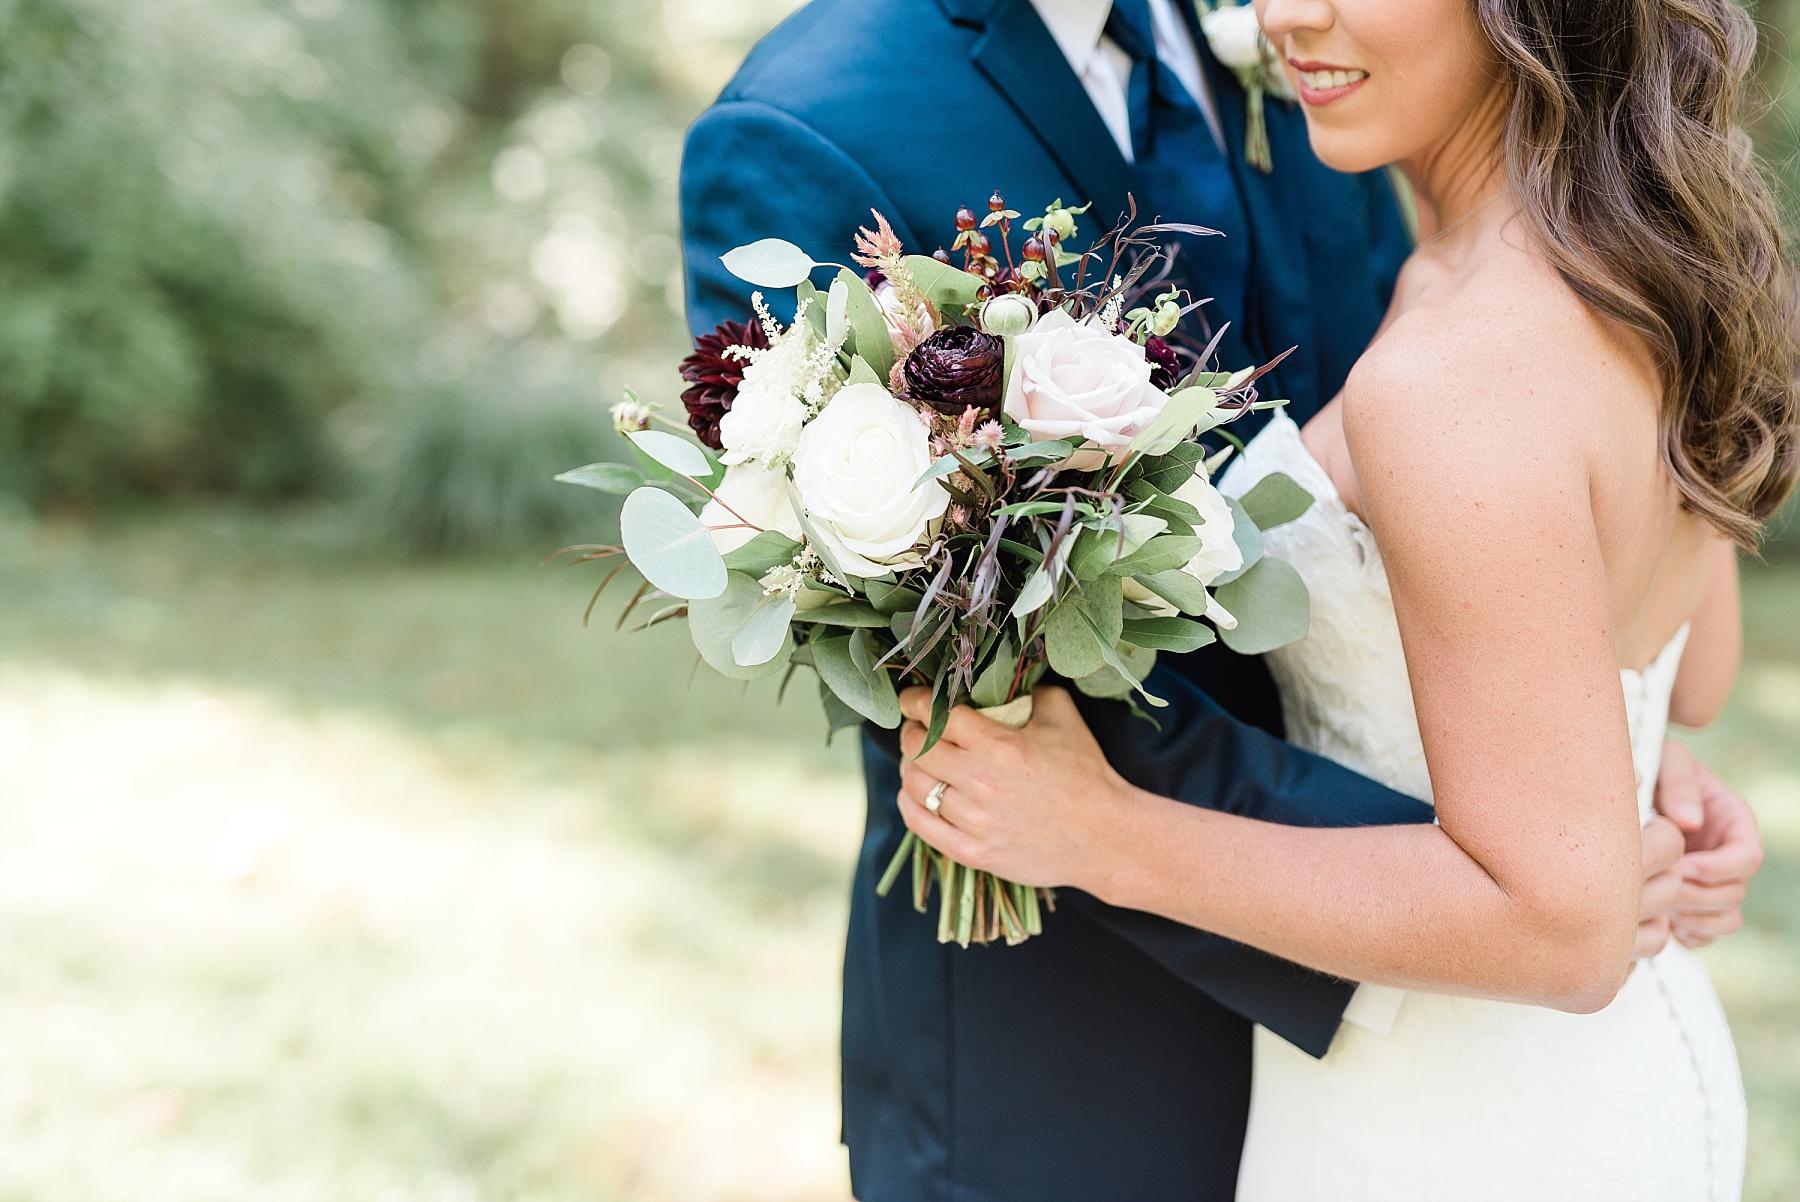 Romantic Summer Sunset Wedding Ceremony at Little Piney Lodge St. Louis Missouri by Kelsi Kliethermes Photography Fine Art Photographer_0002.jpg